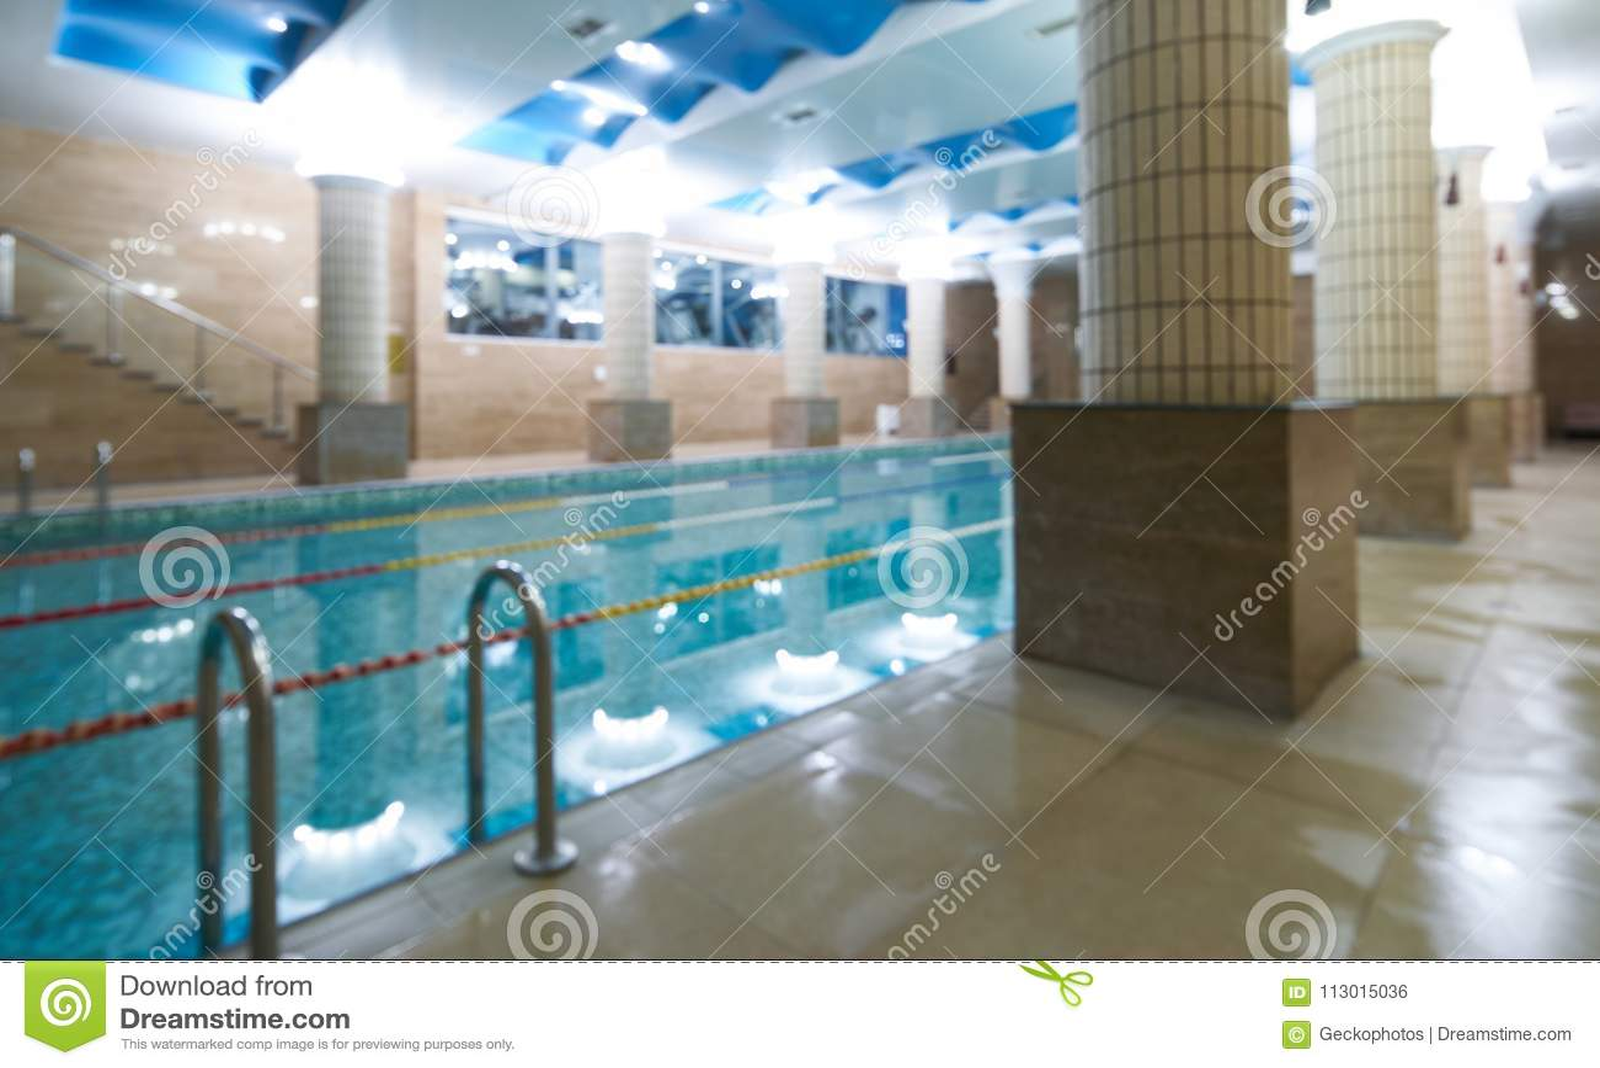 Indoor public swimming pool interior in fitness gym club stock photo image of indoor health for Alderwood pool public swim times